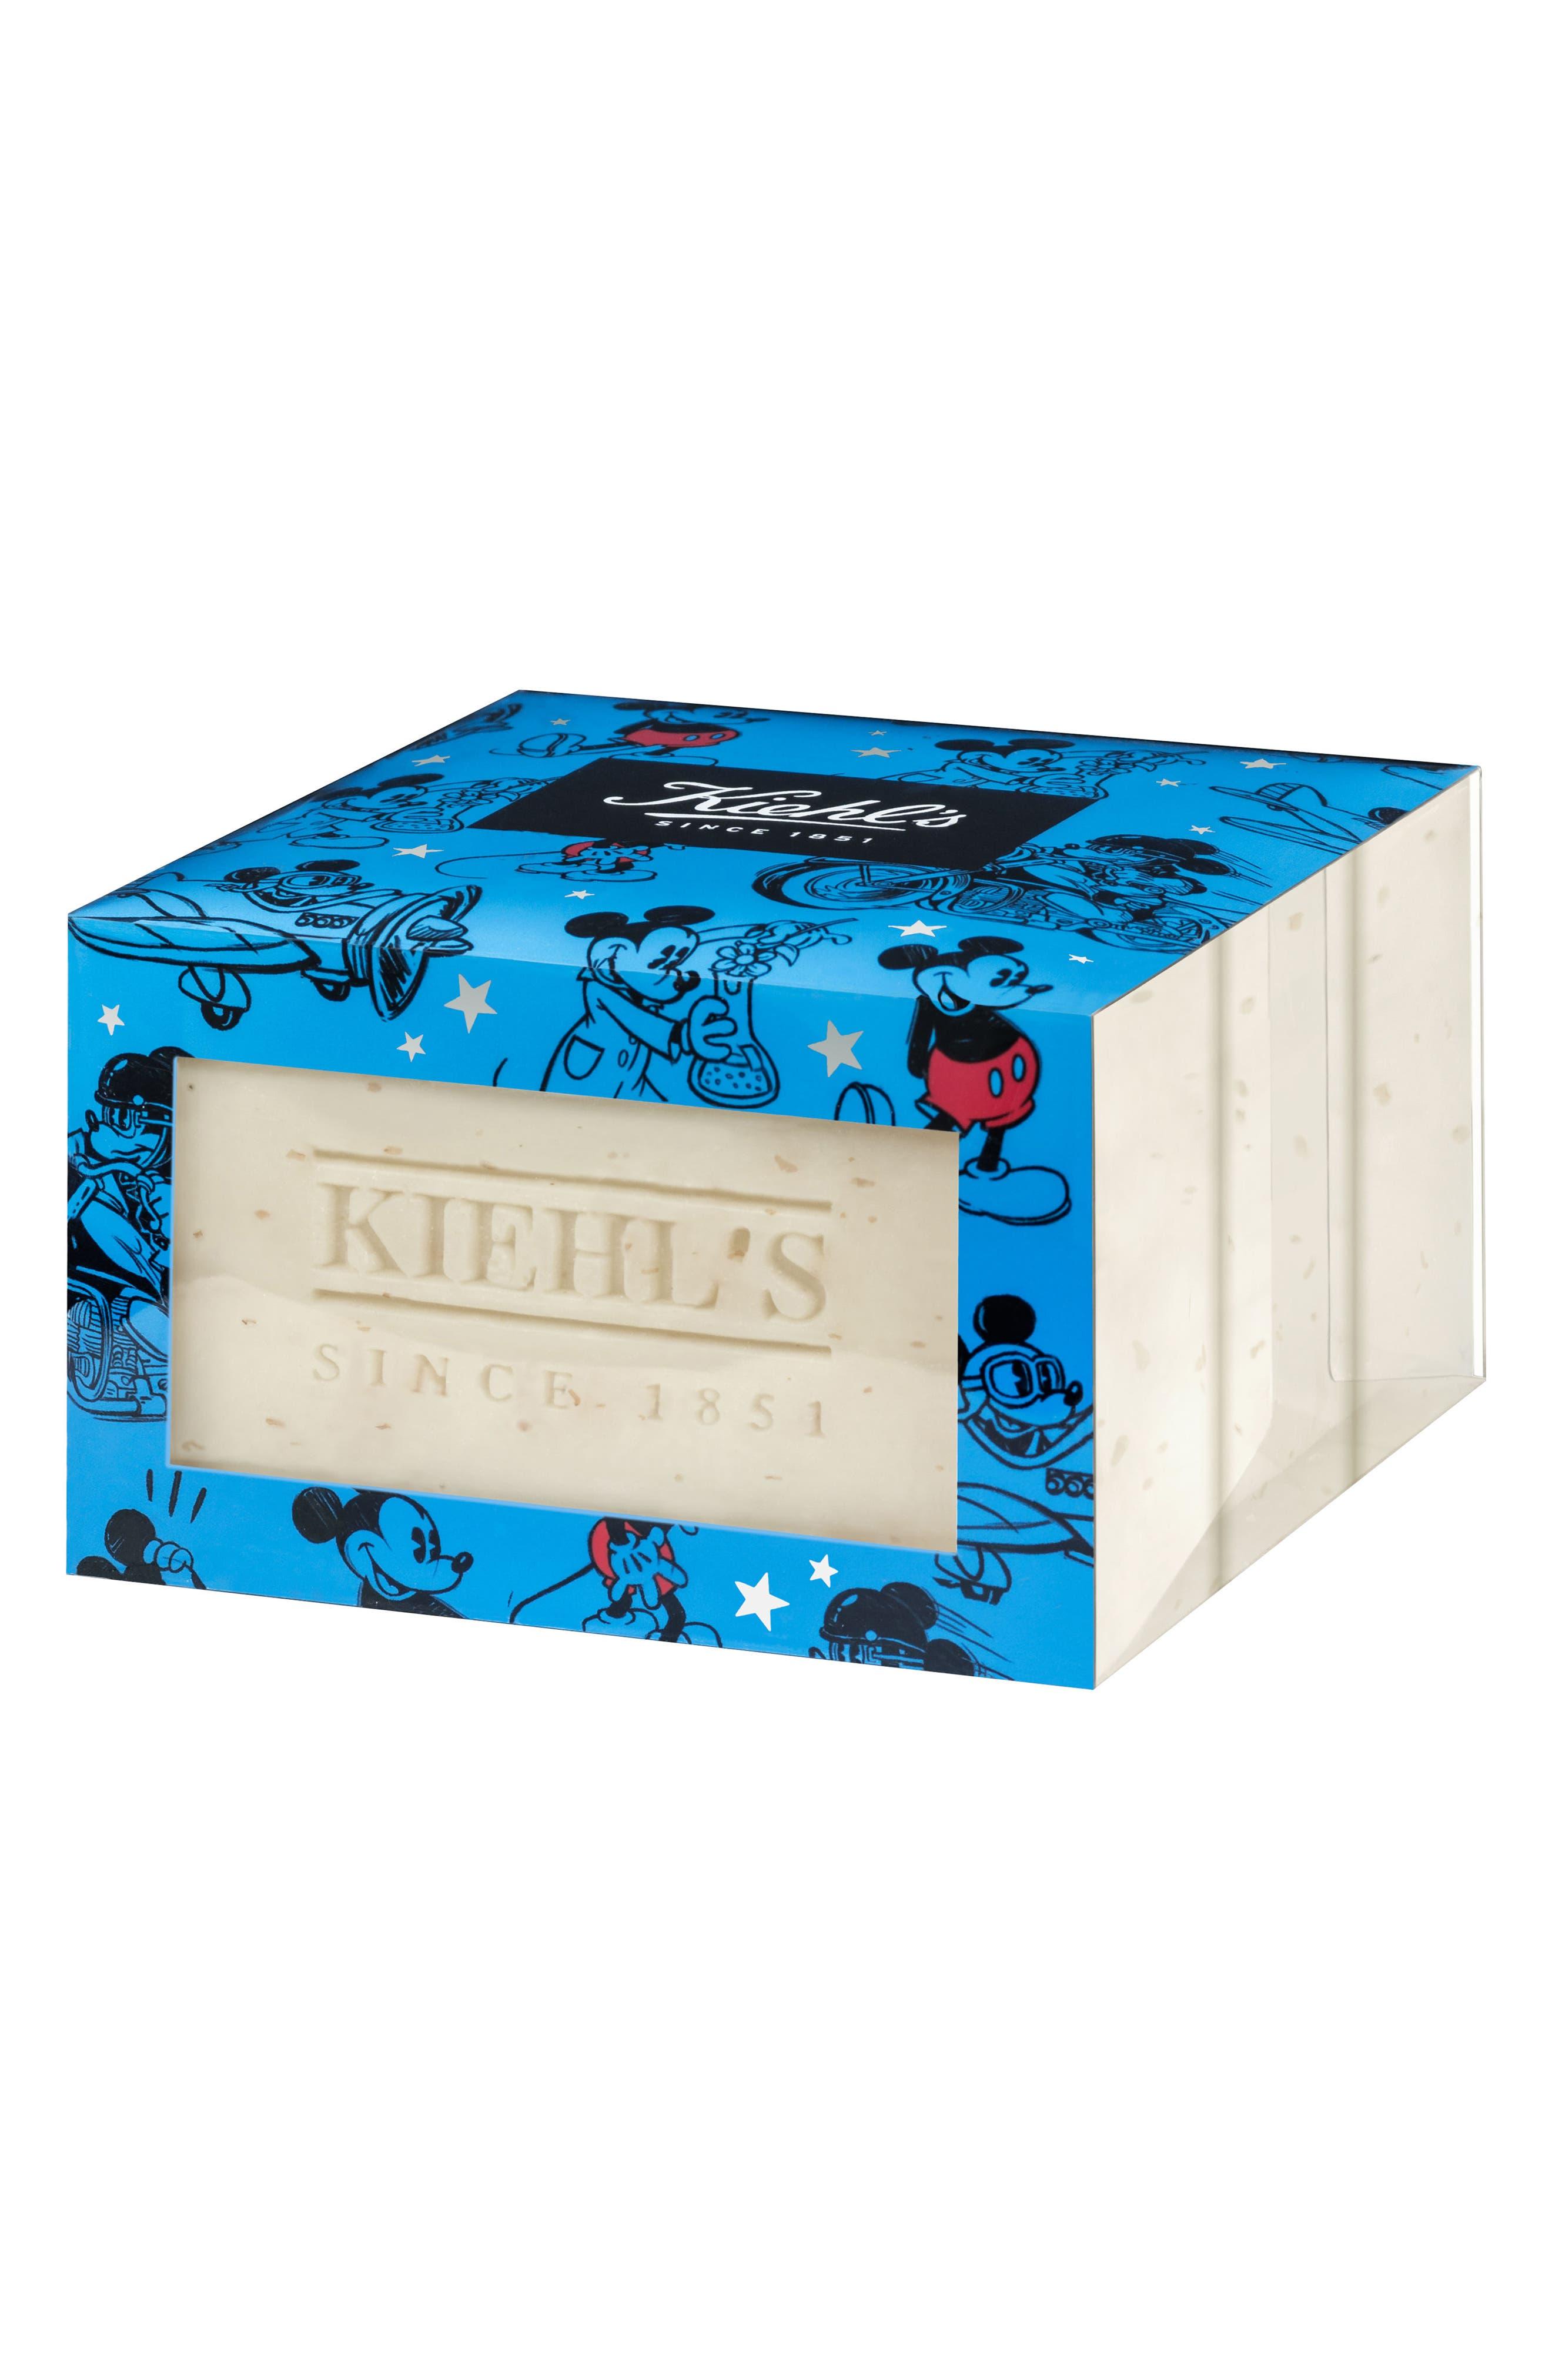 Disney x Kiehl's Since 1851 Ultimate Man Body Scrub Soap Trio ($45 Value)